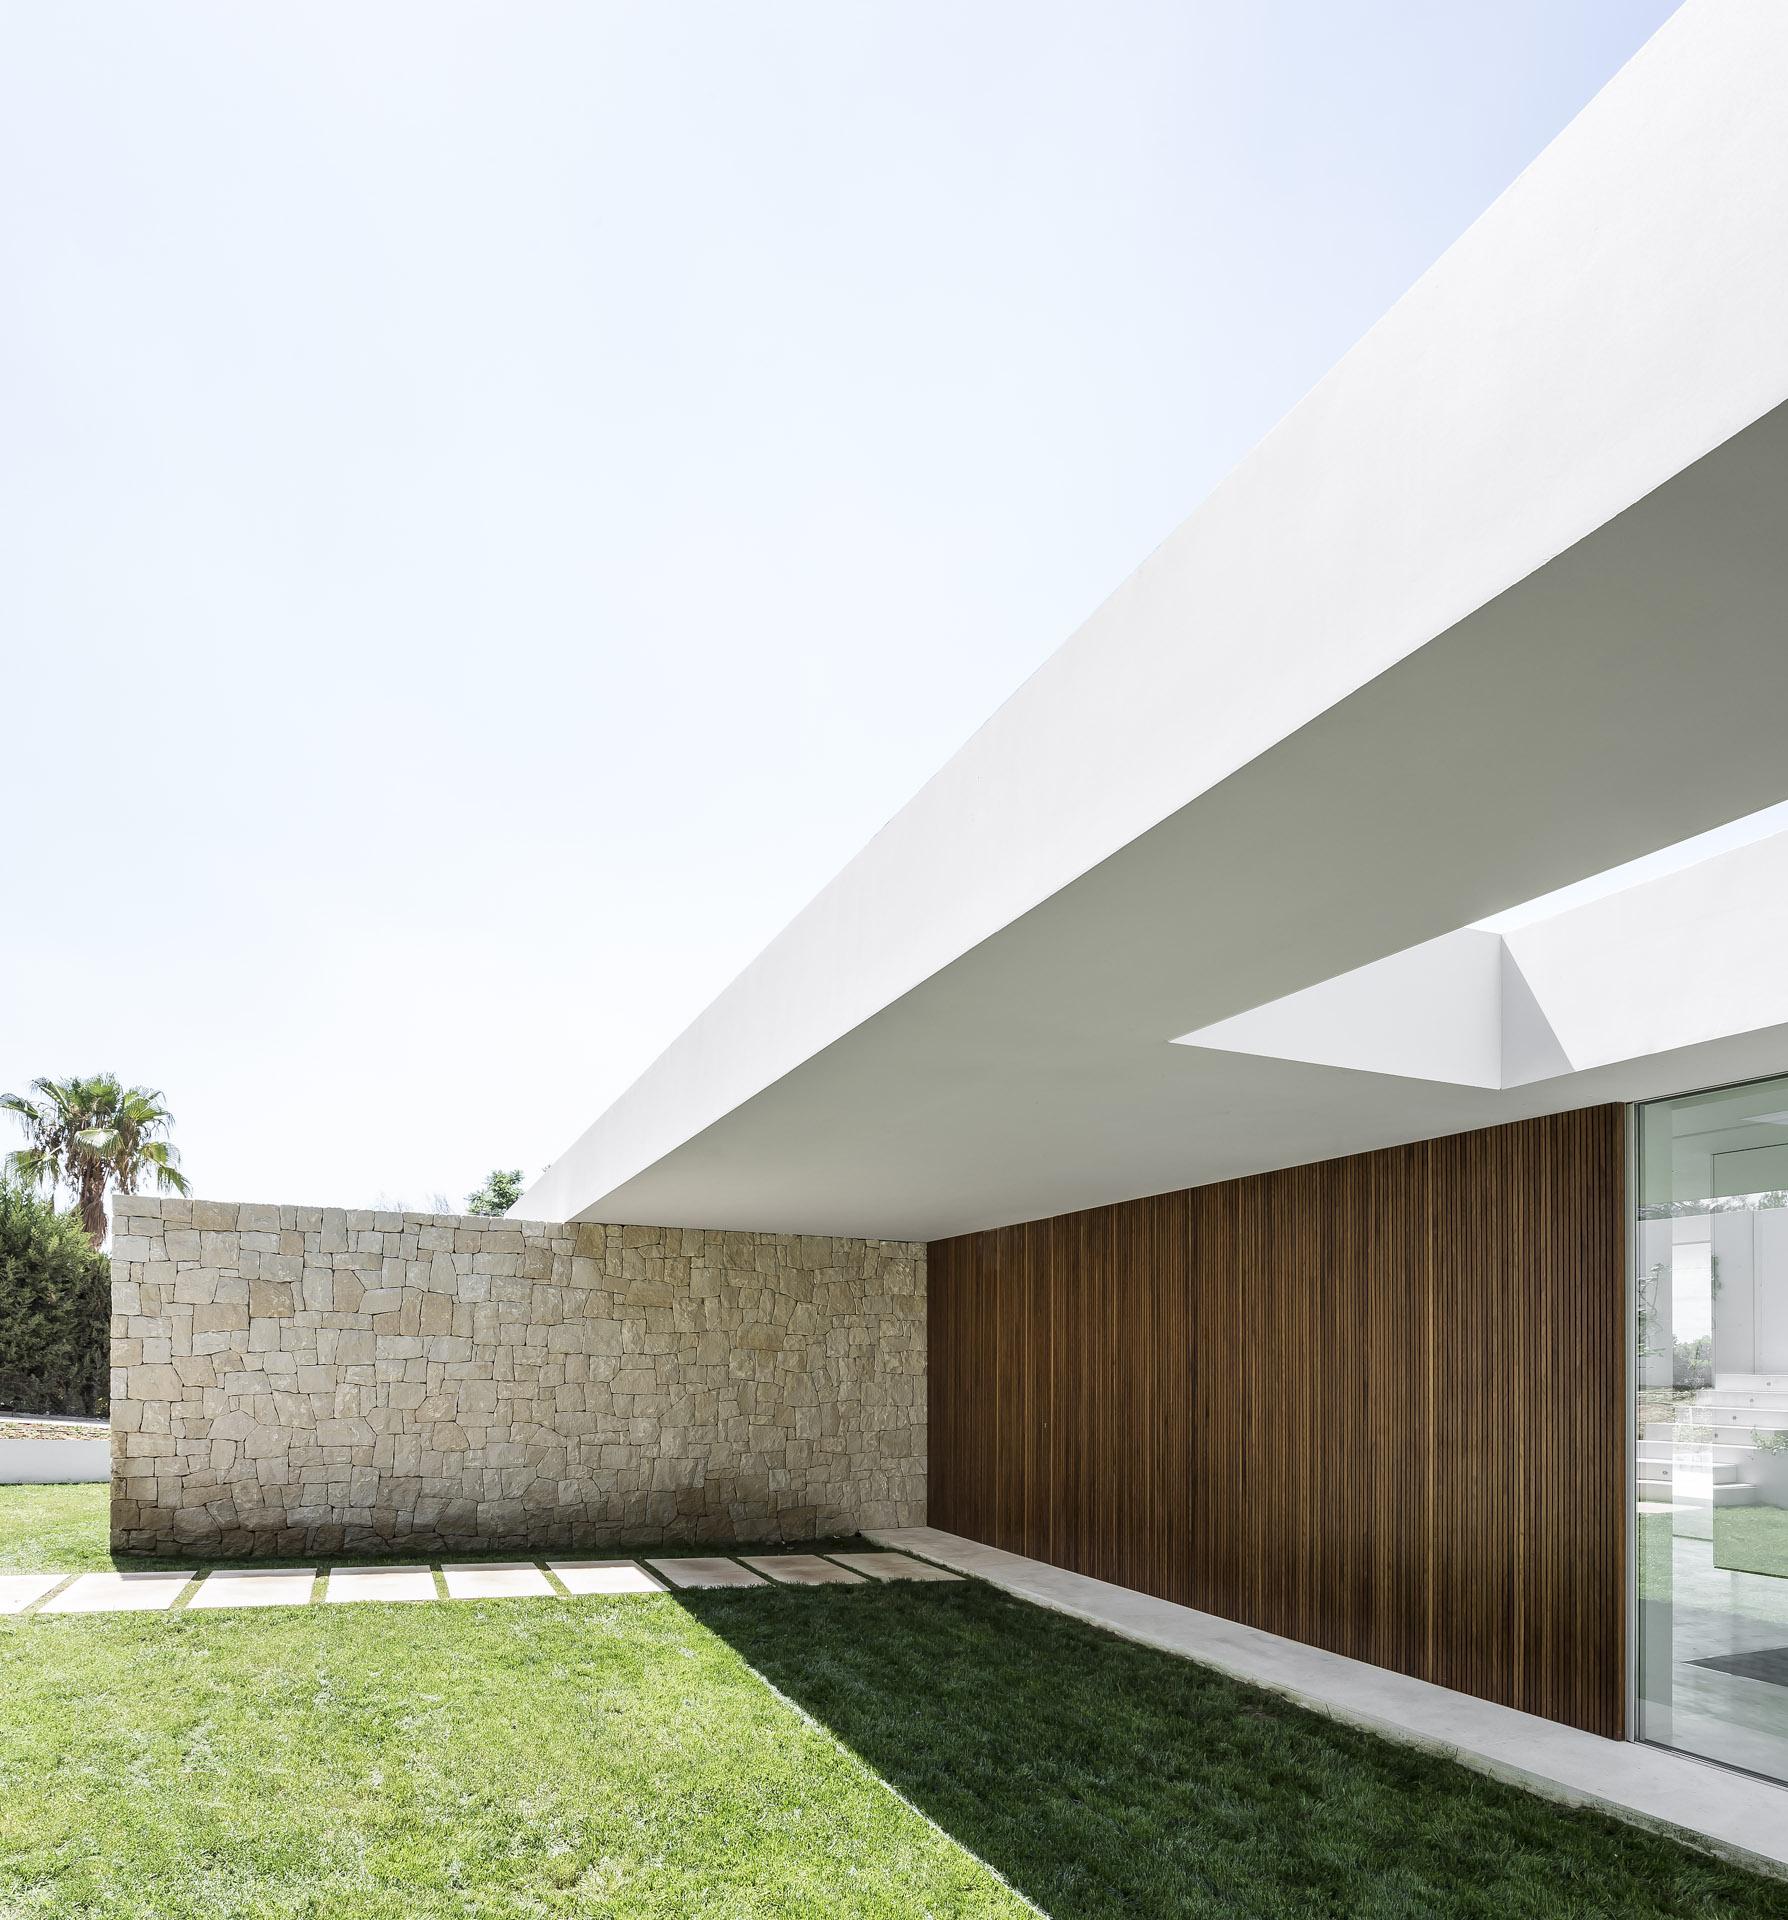 fotografia-arquitectura-valencia-german-cabo-gallardo-llopis-villamarchante-vivienda-08